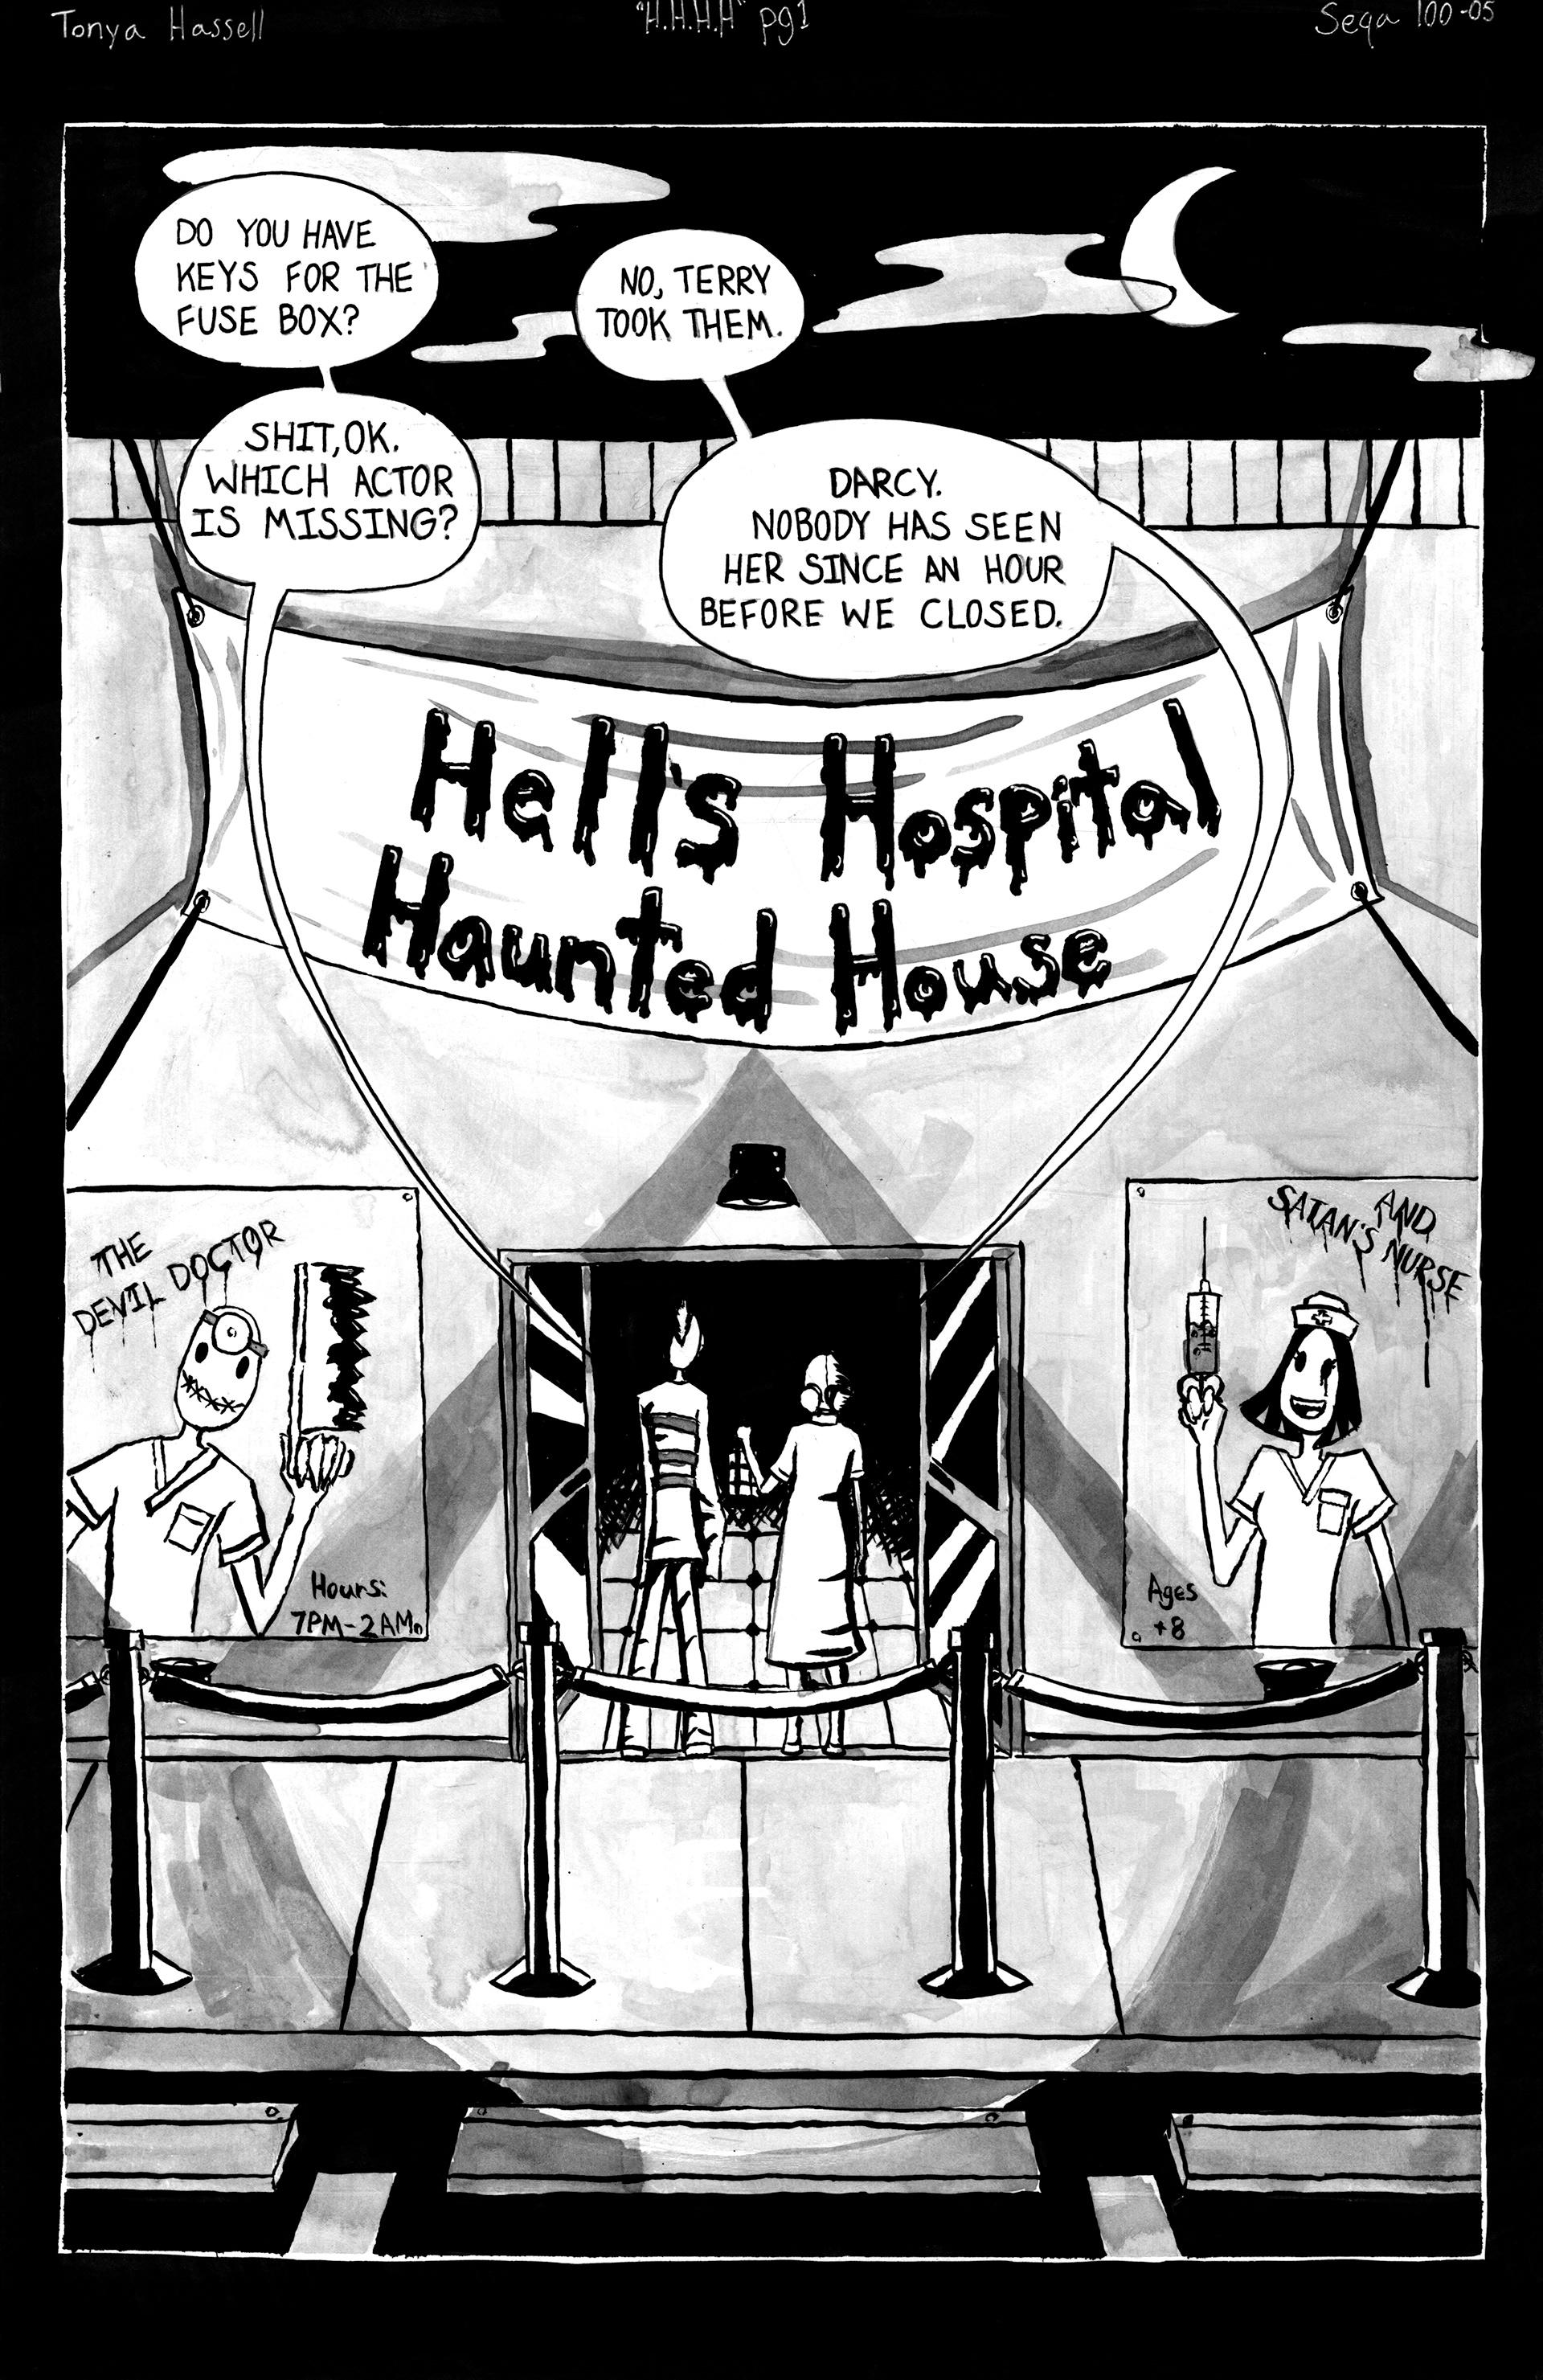 Tonya Hell - Hell's Hospital Haunted House Comic on